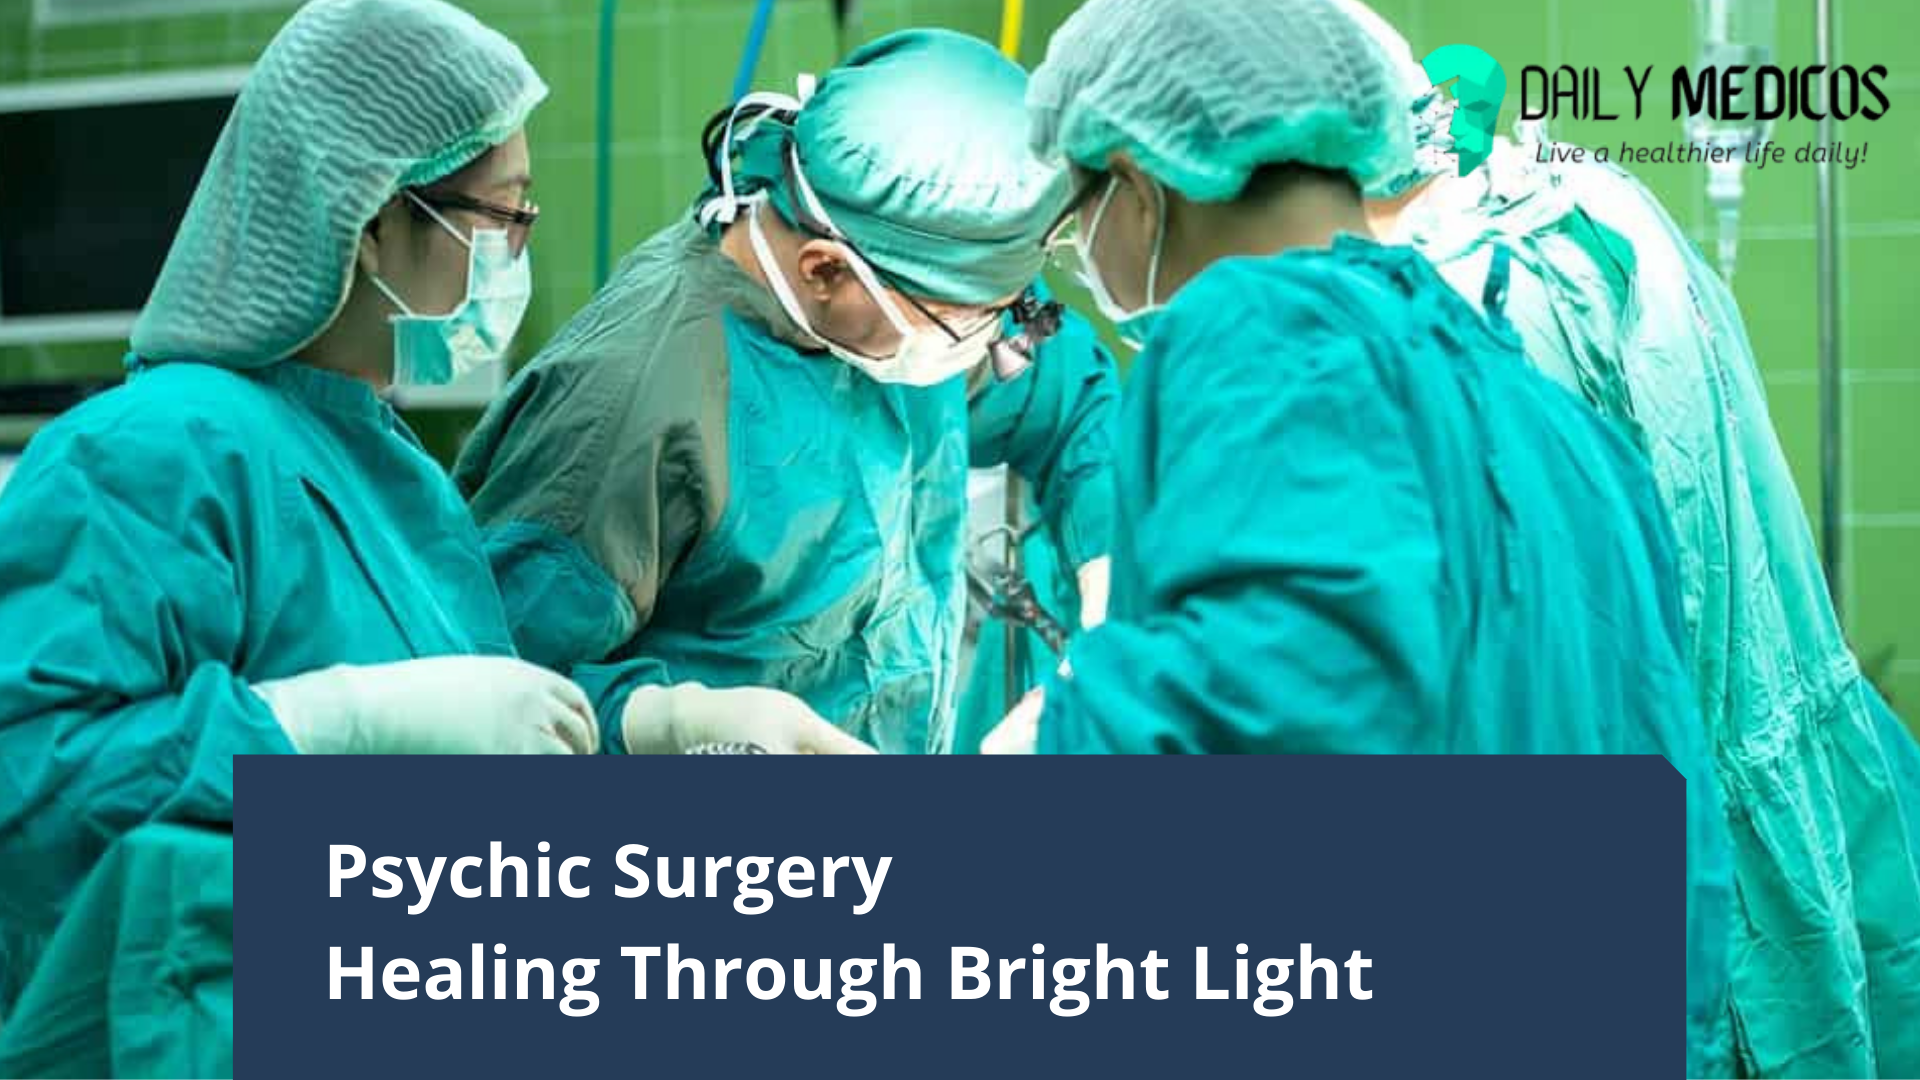 Psychic Surgery - Healing Through Bright Light